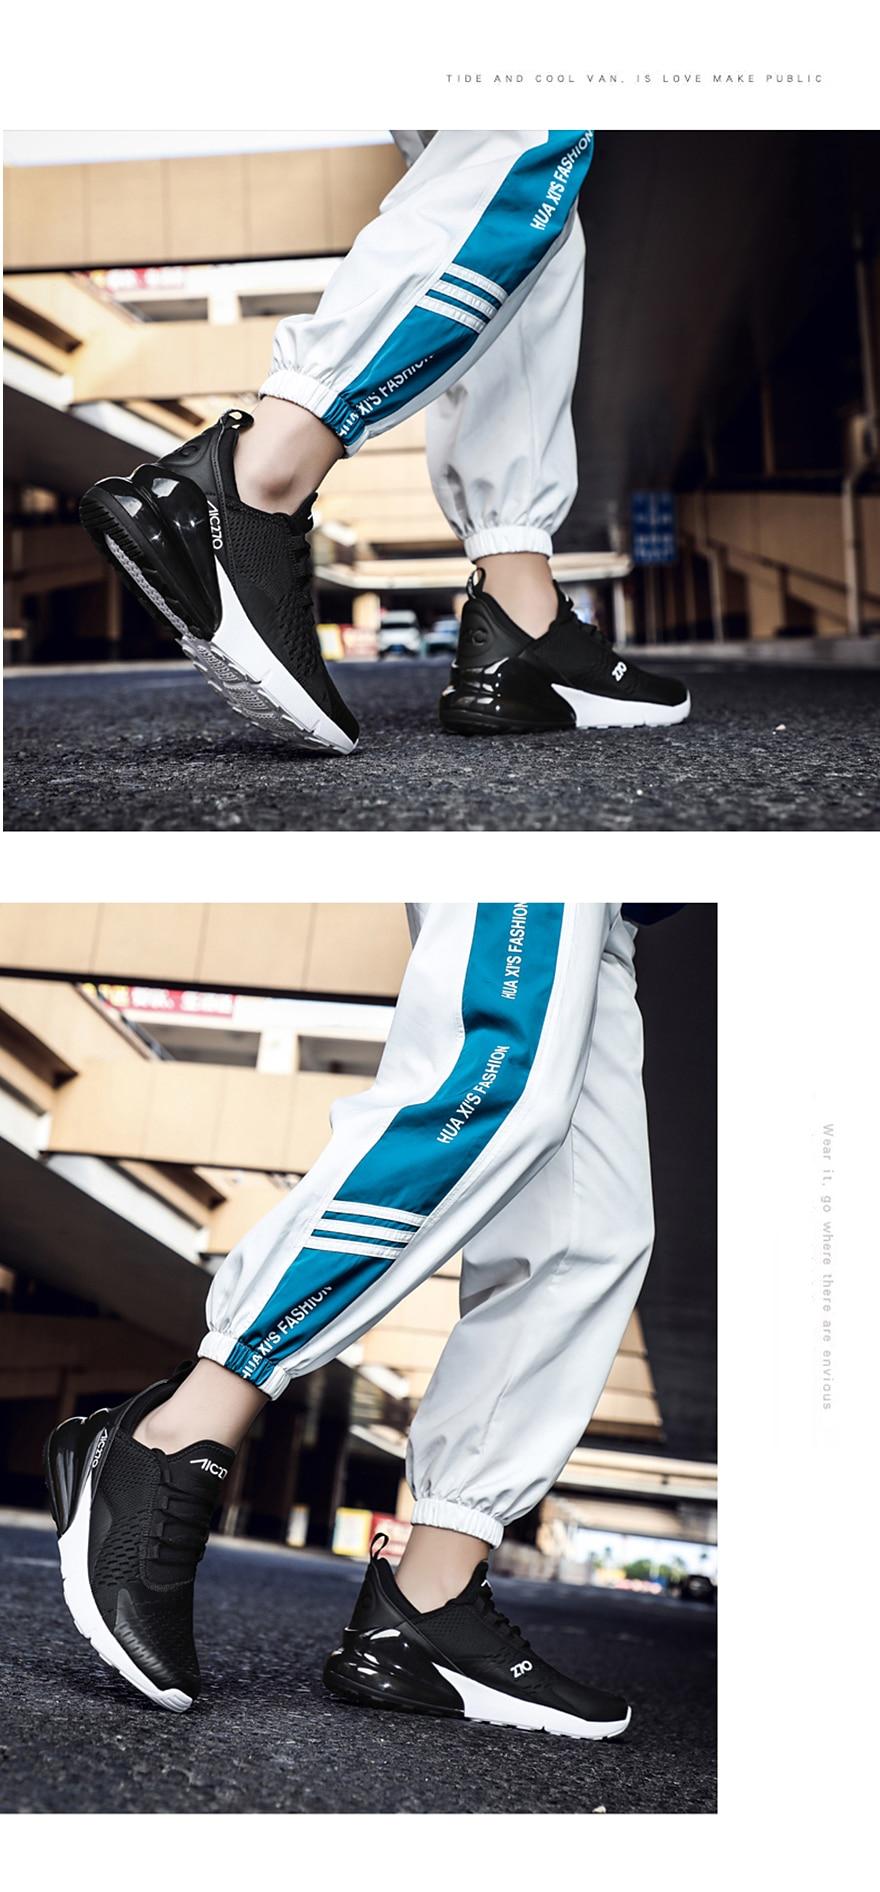 HTB1U7n5RjTpK1RjSZKPq6y3UpXaI 2019 Casual Shoes Men Lightweight Running Male Shoes Breathable Mesh Sport Men Sneakers Flat Outdoor Footwear Summer Trainers